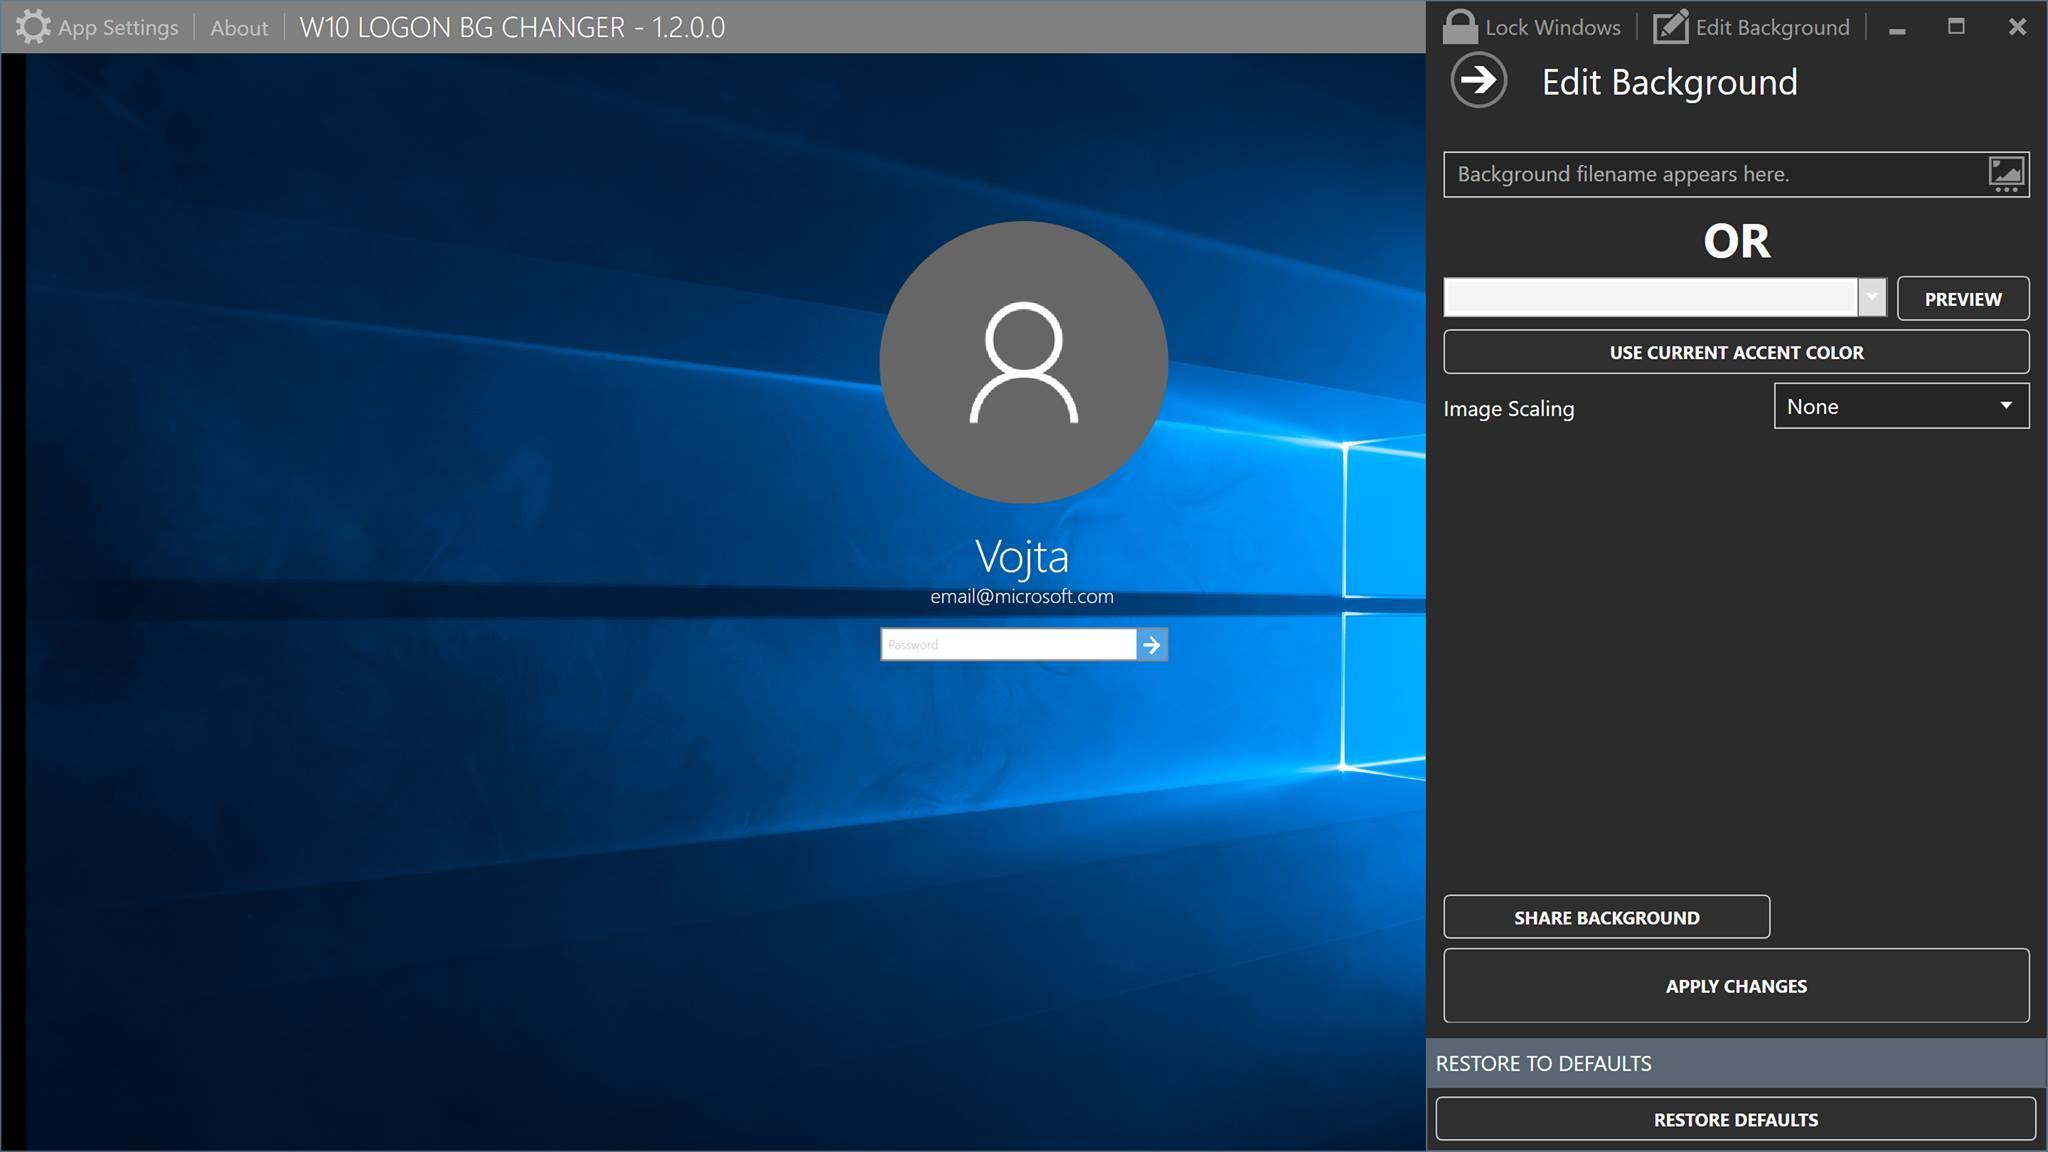 Windows 7 Logon Background Changer 1 3 4 программа для